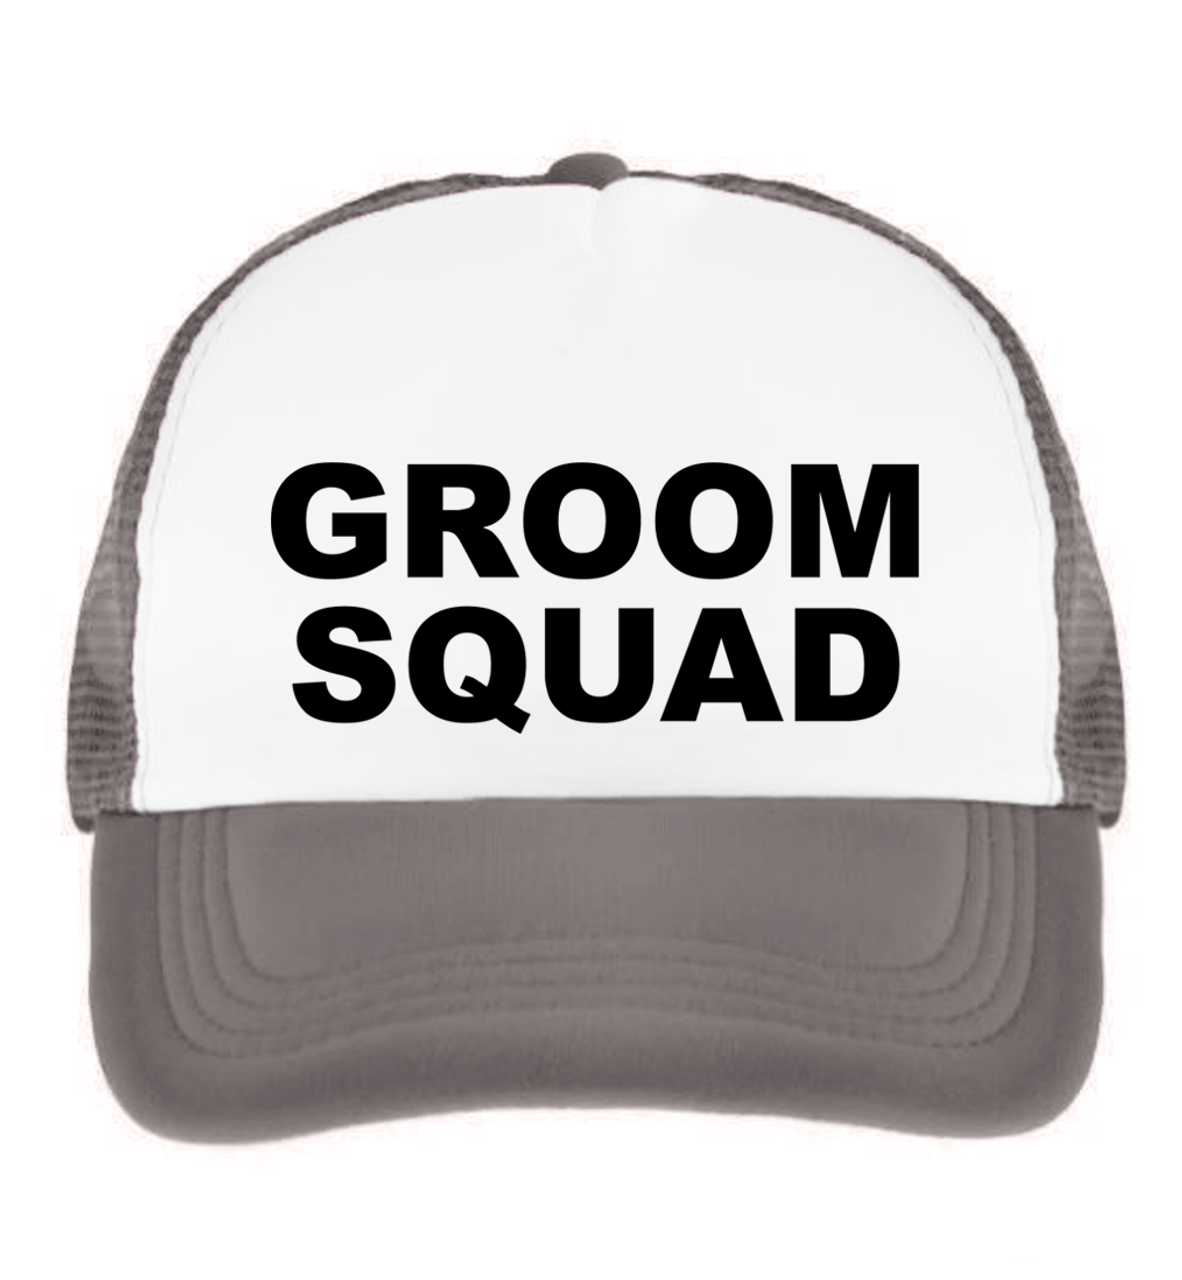 Groom Squad Trucker Hat - Girleo ba3c73d793fa